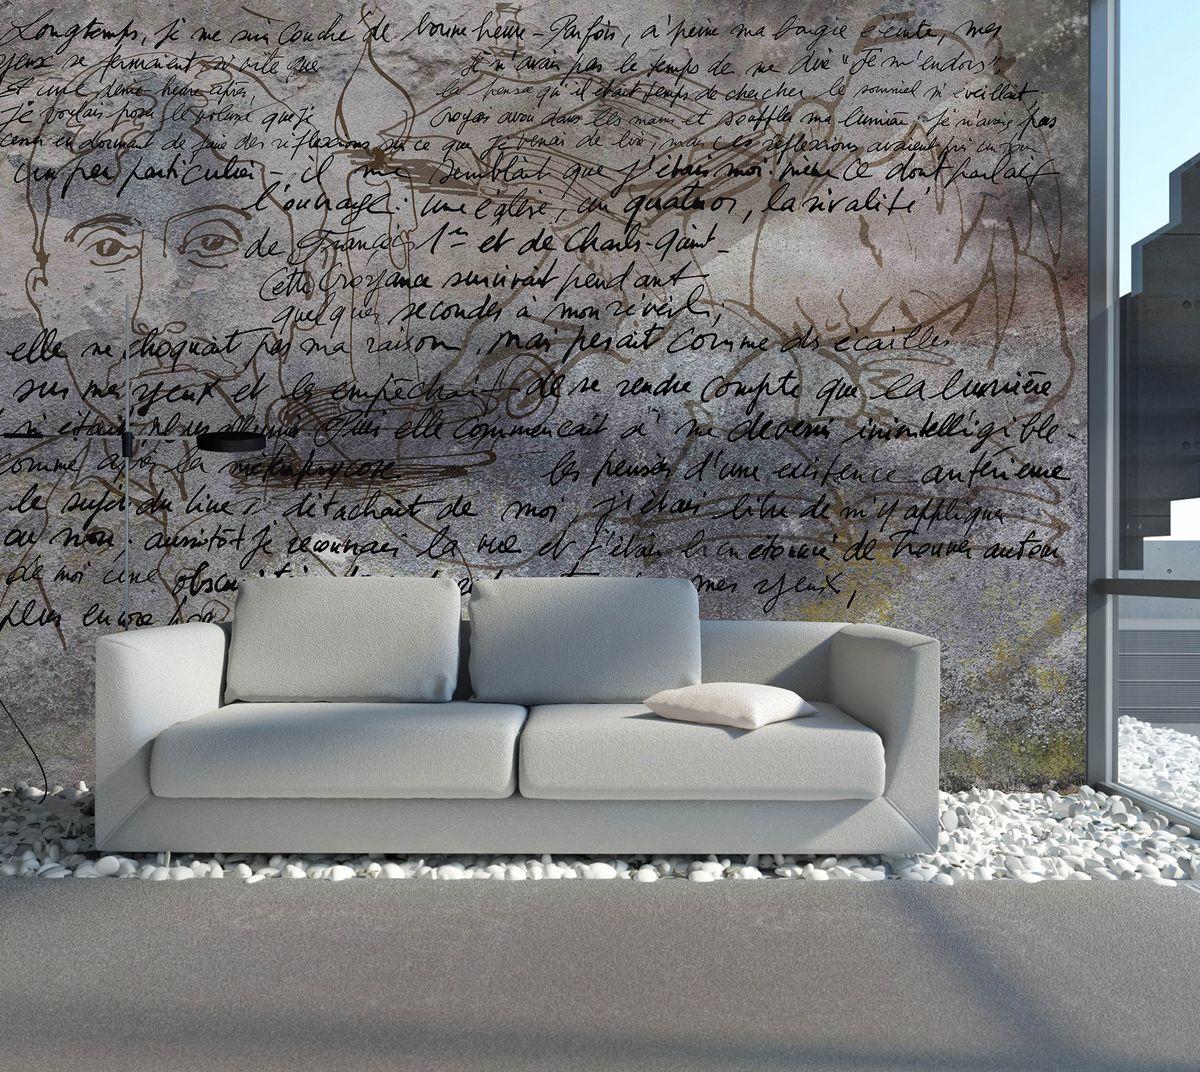 recherche fond blanc incr ation rev tement mural et. Black Bedroom Furniture Sets. Home Design Ideas